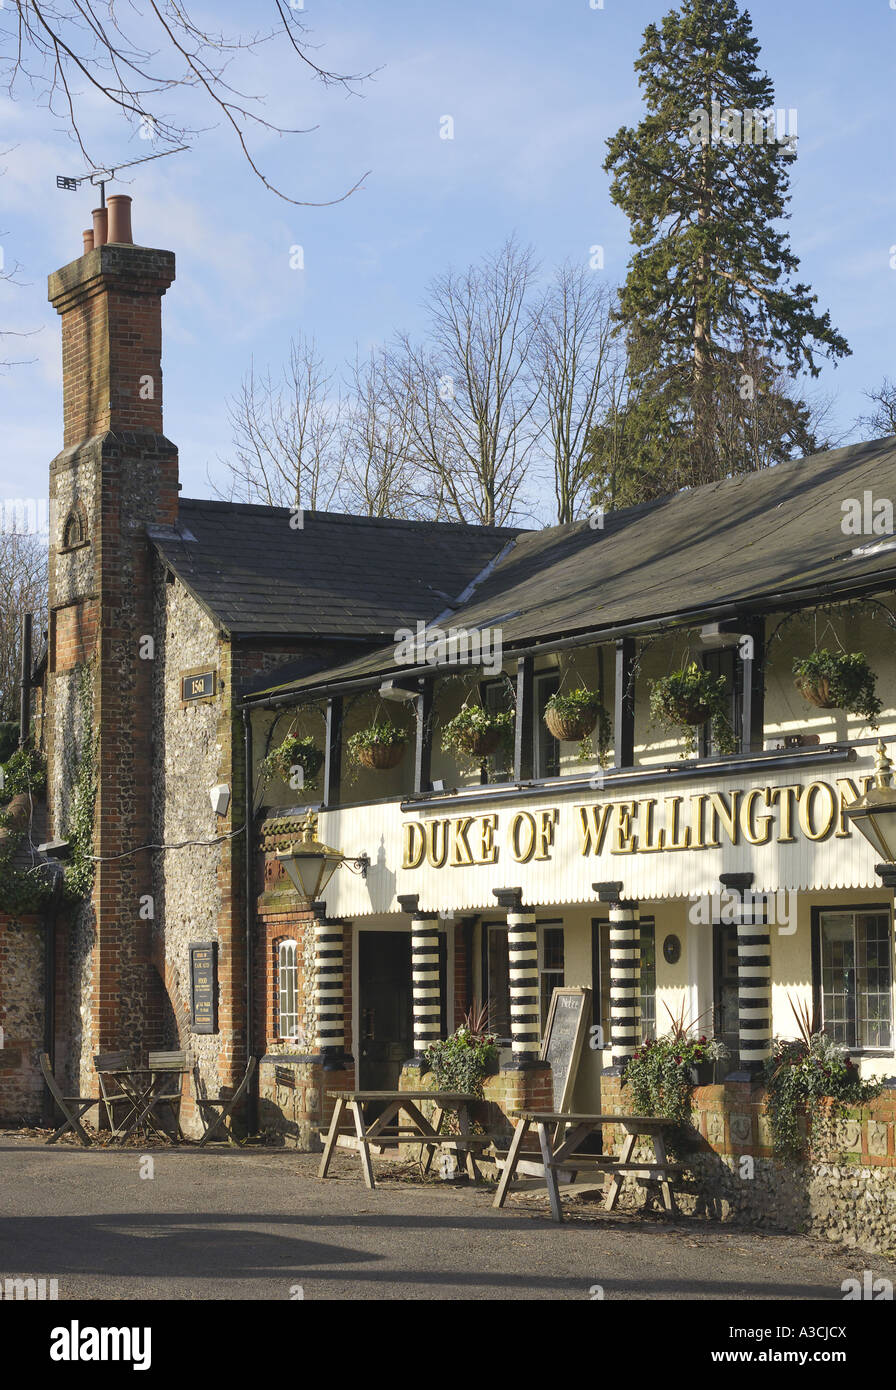 the Duke of Wellington an old coaching inn in East Horsley Surrey - Stock Image